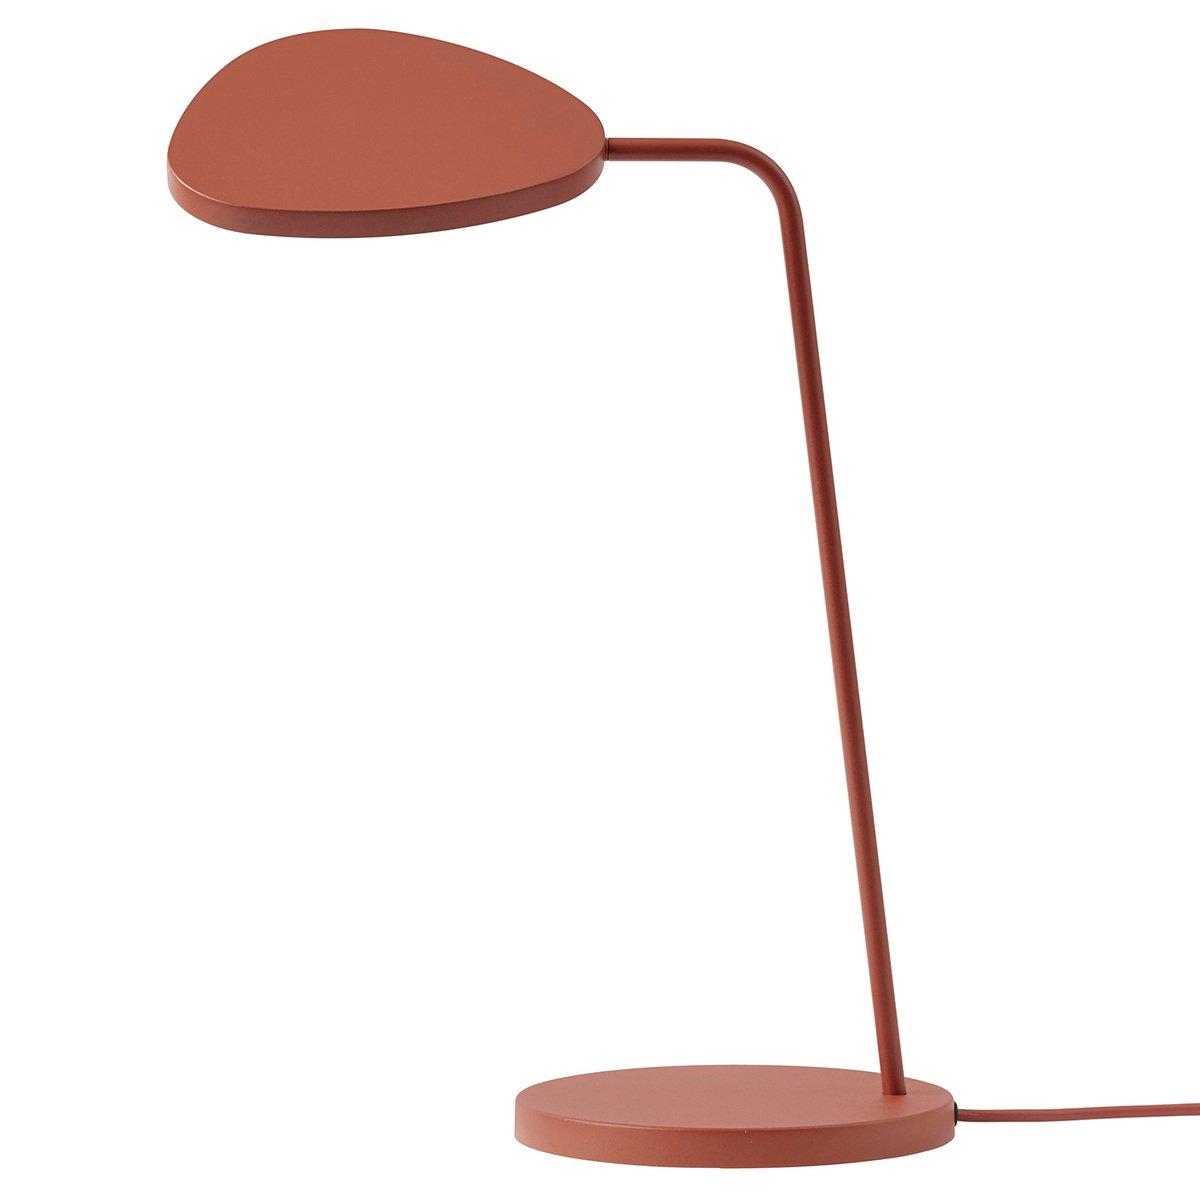 Muuto Leaf Table Lamp, Copper Brown